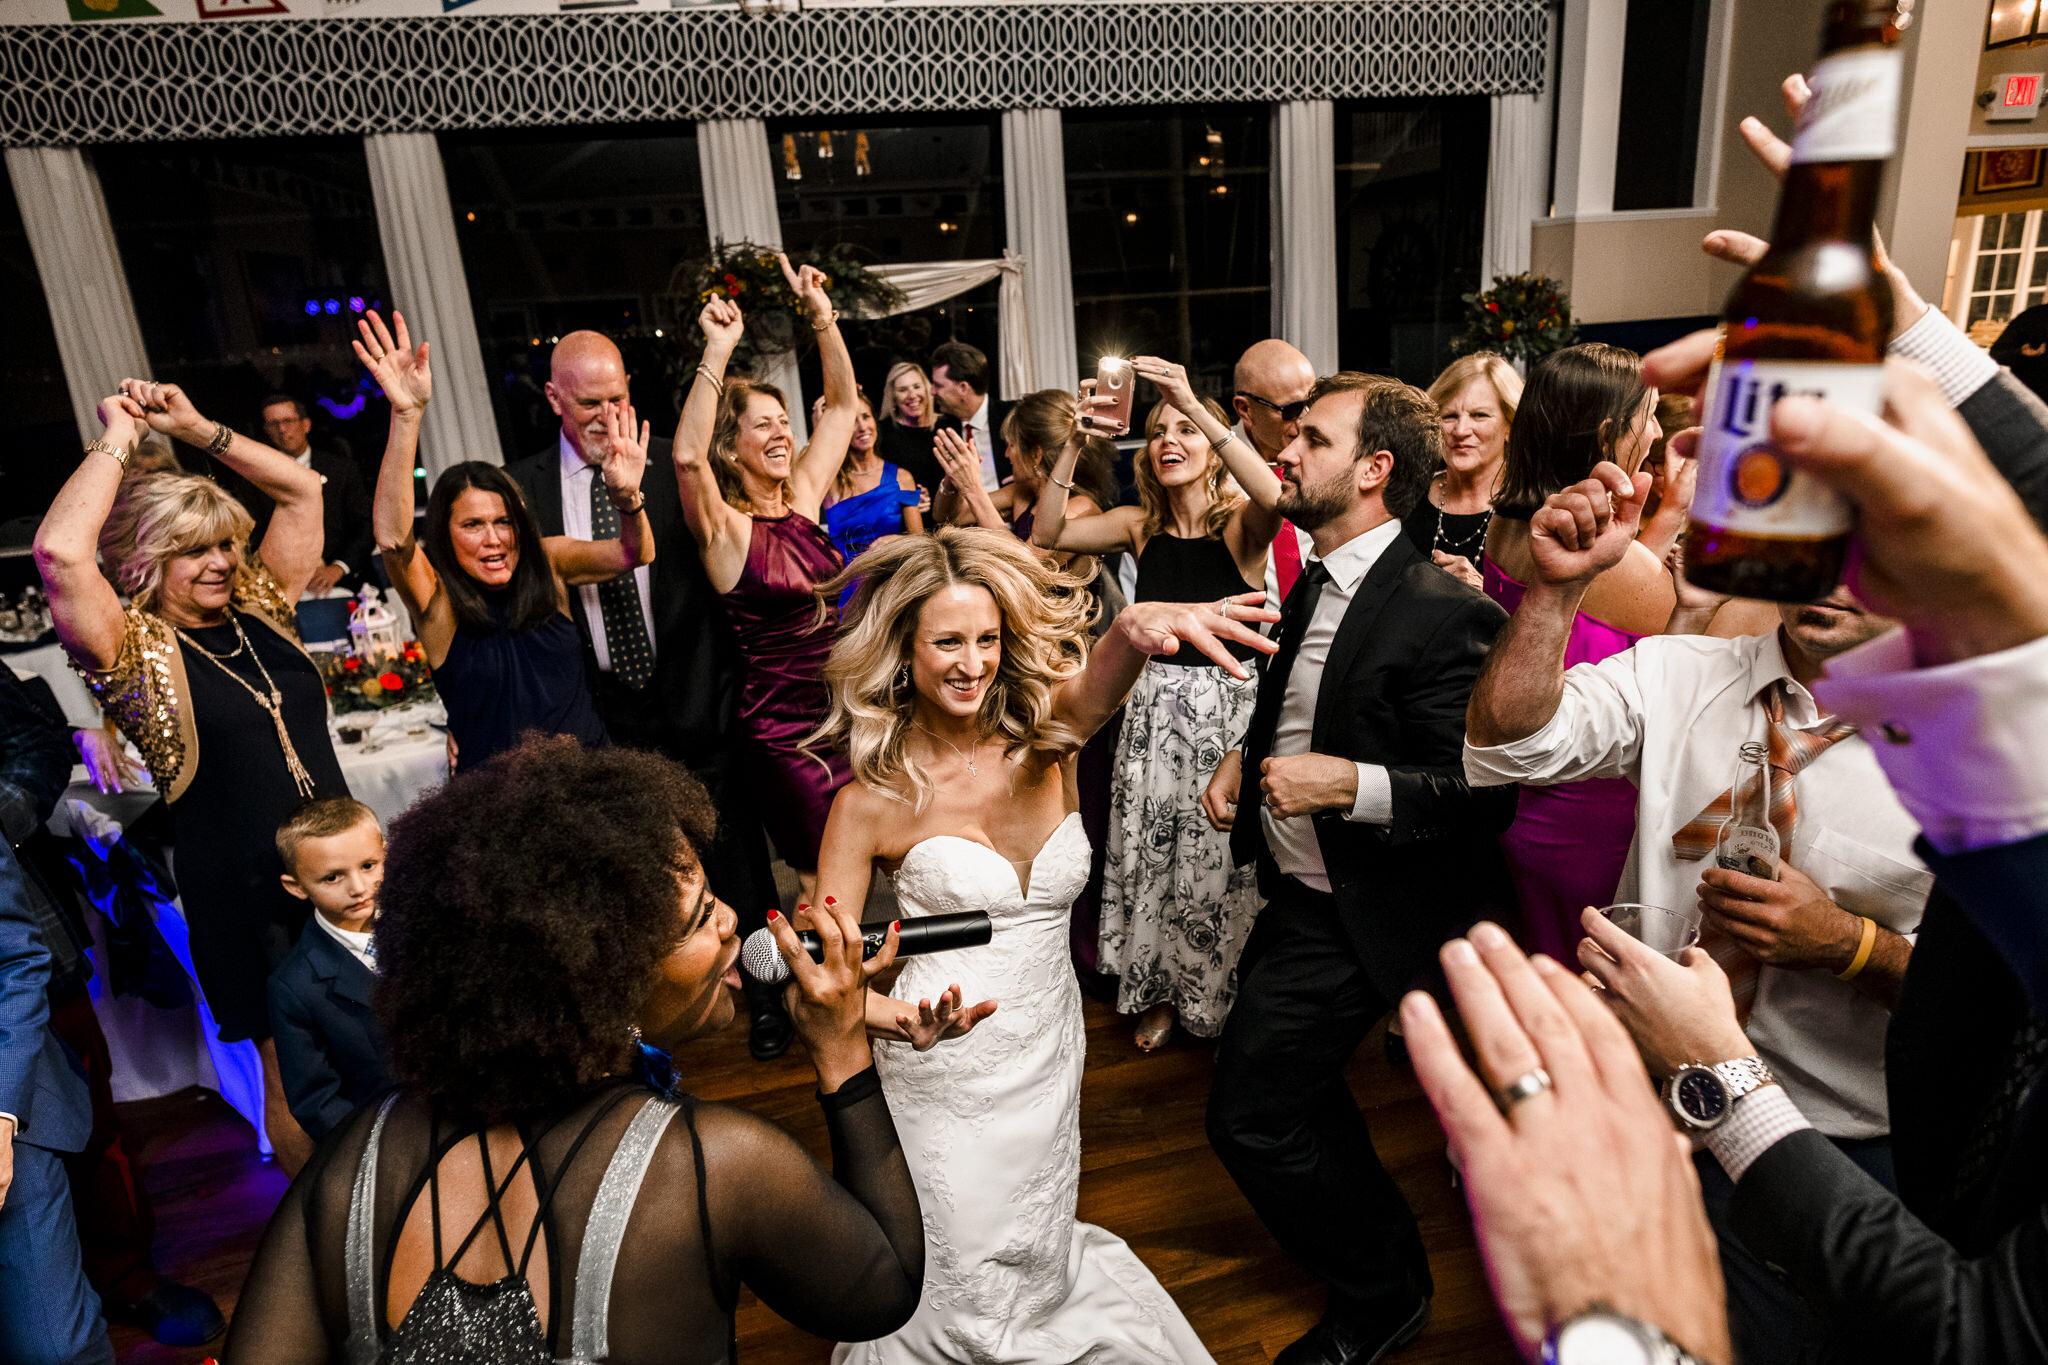 Snell-Ocean-City-Yacht-Club-New-Jersey-Wedding-Photographer-47.JPG